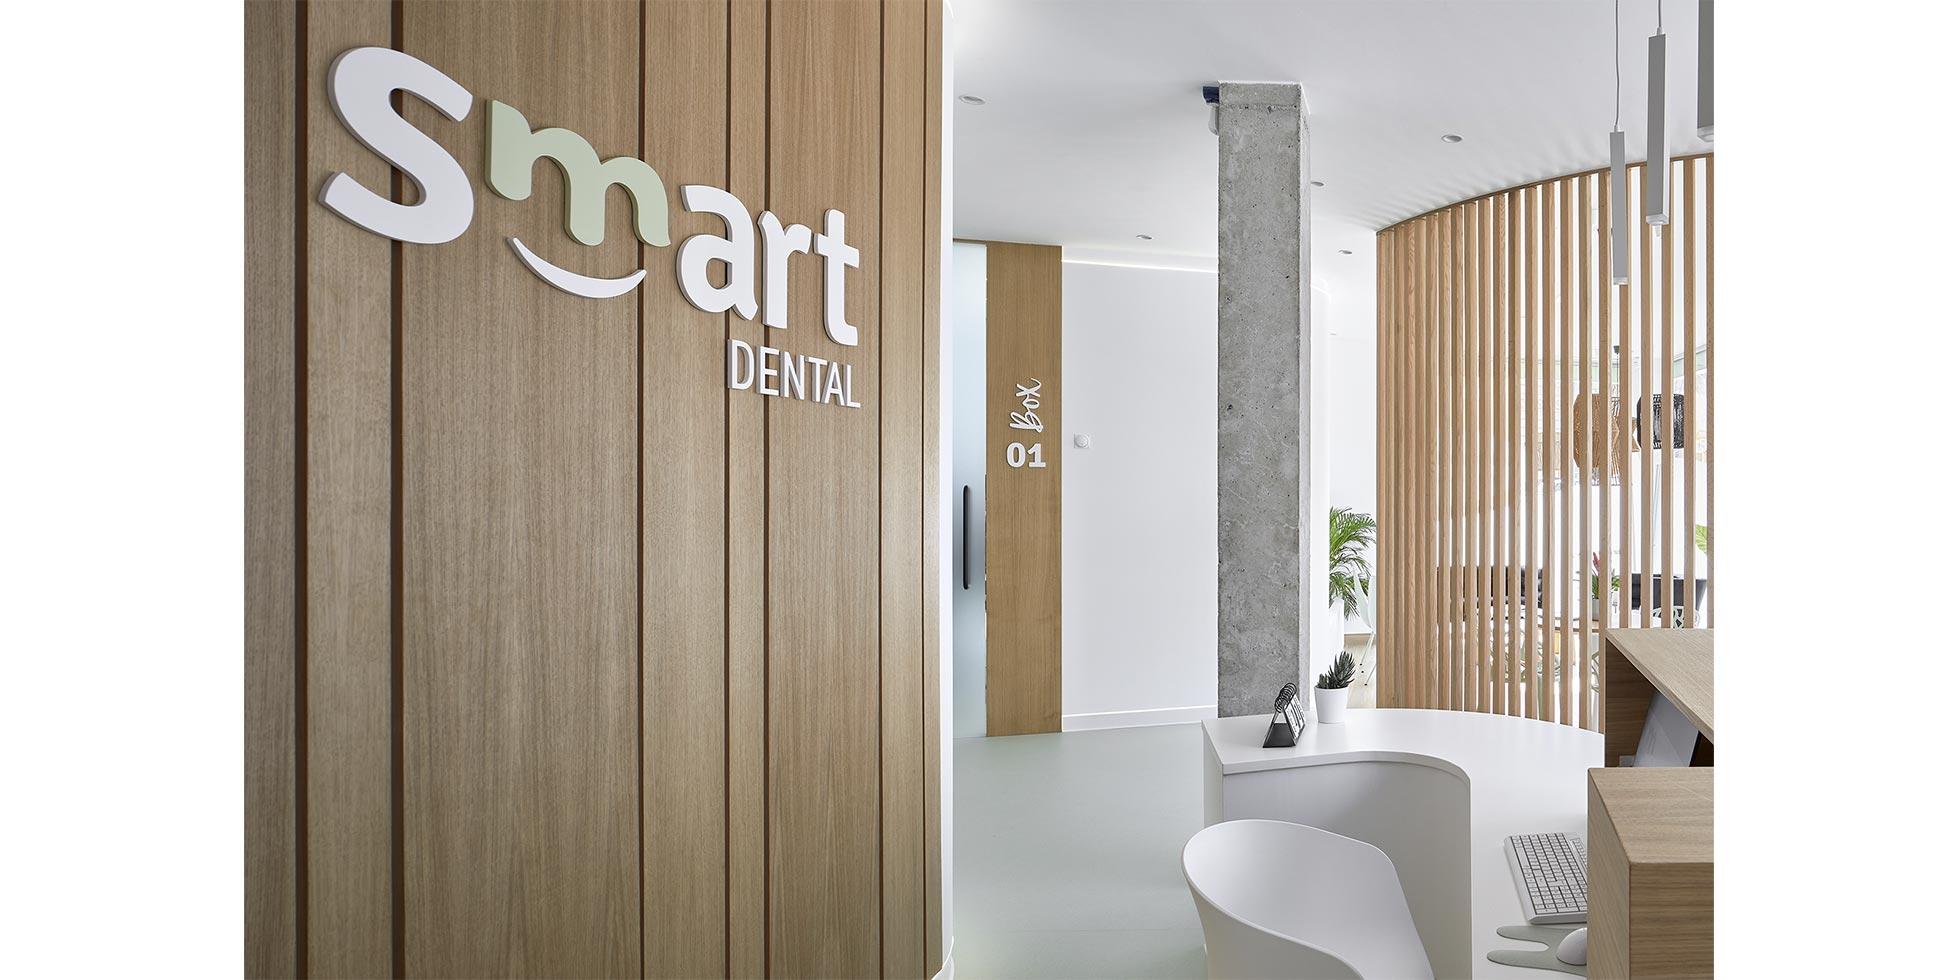 28 clinica dental smart 26